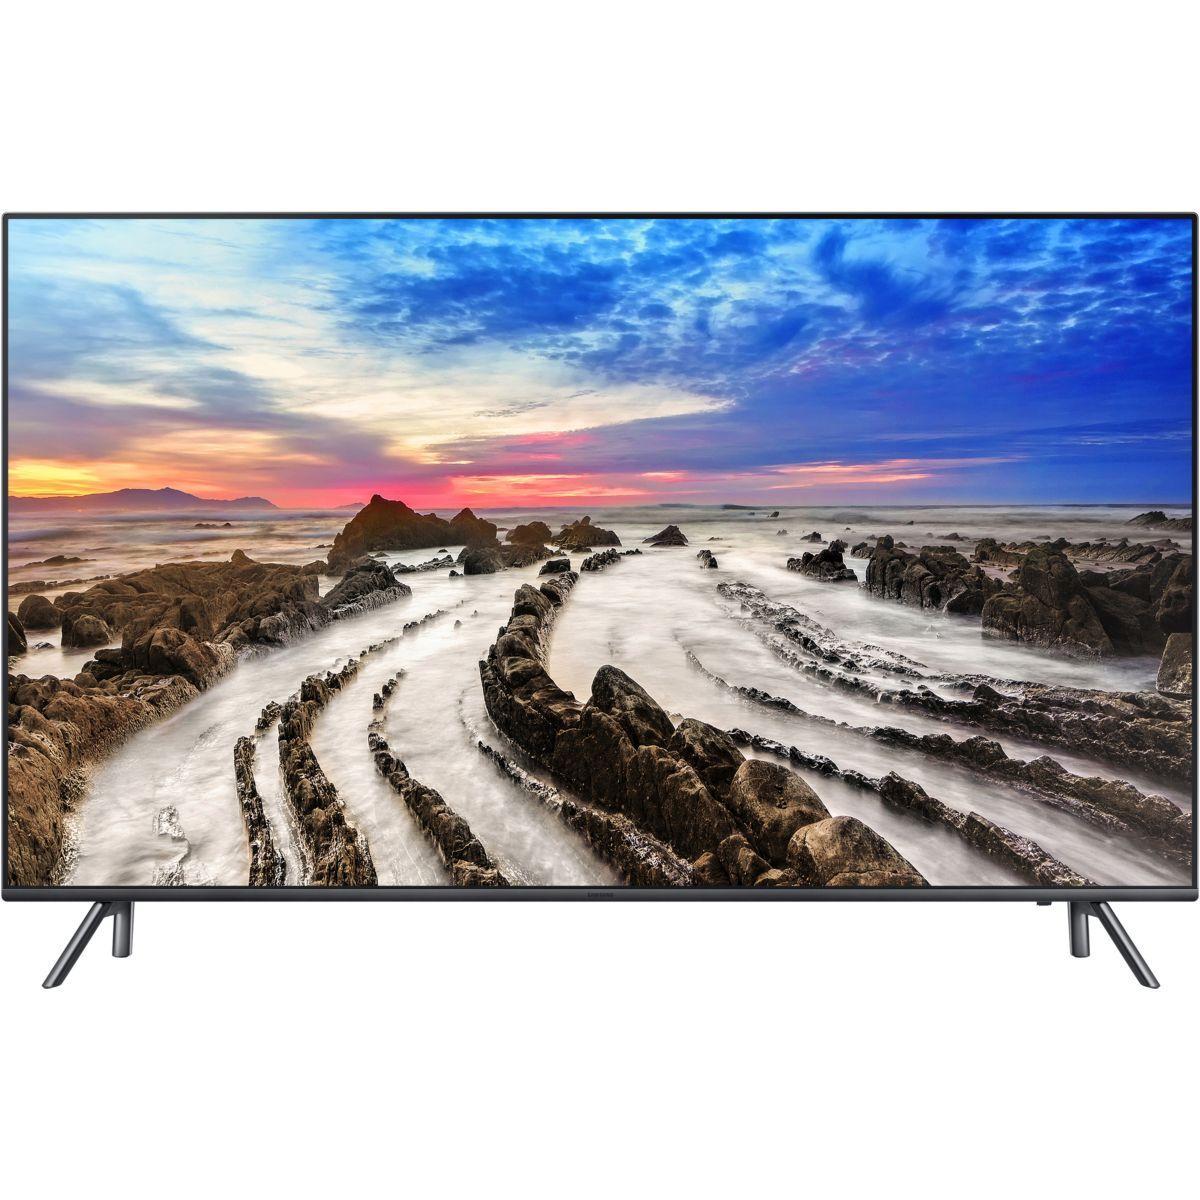 Tv led samsung ue49mu7055 - livraison offerte : code liv